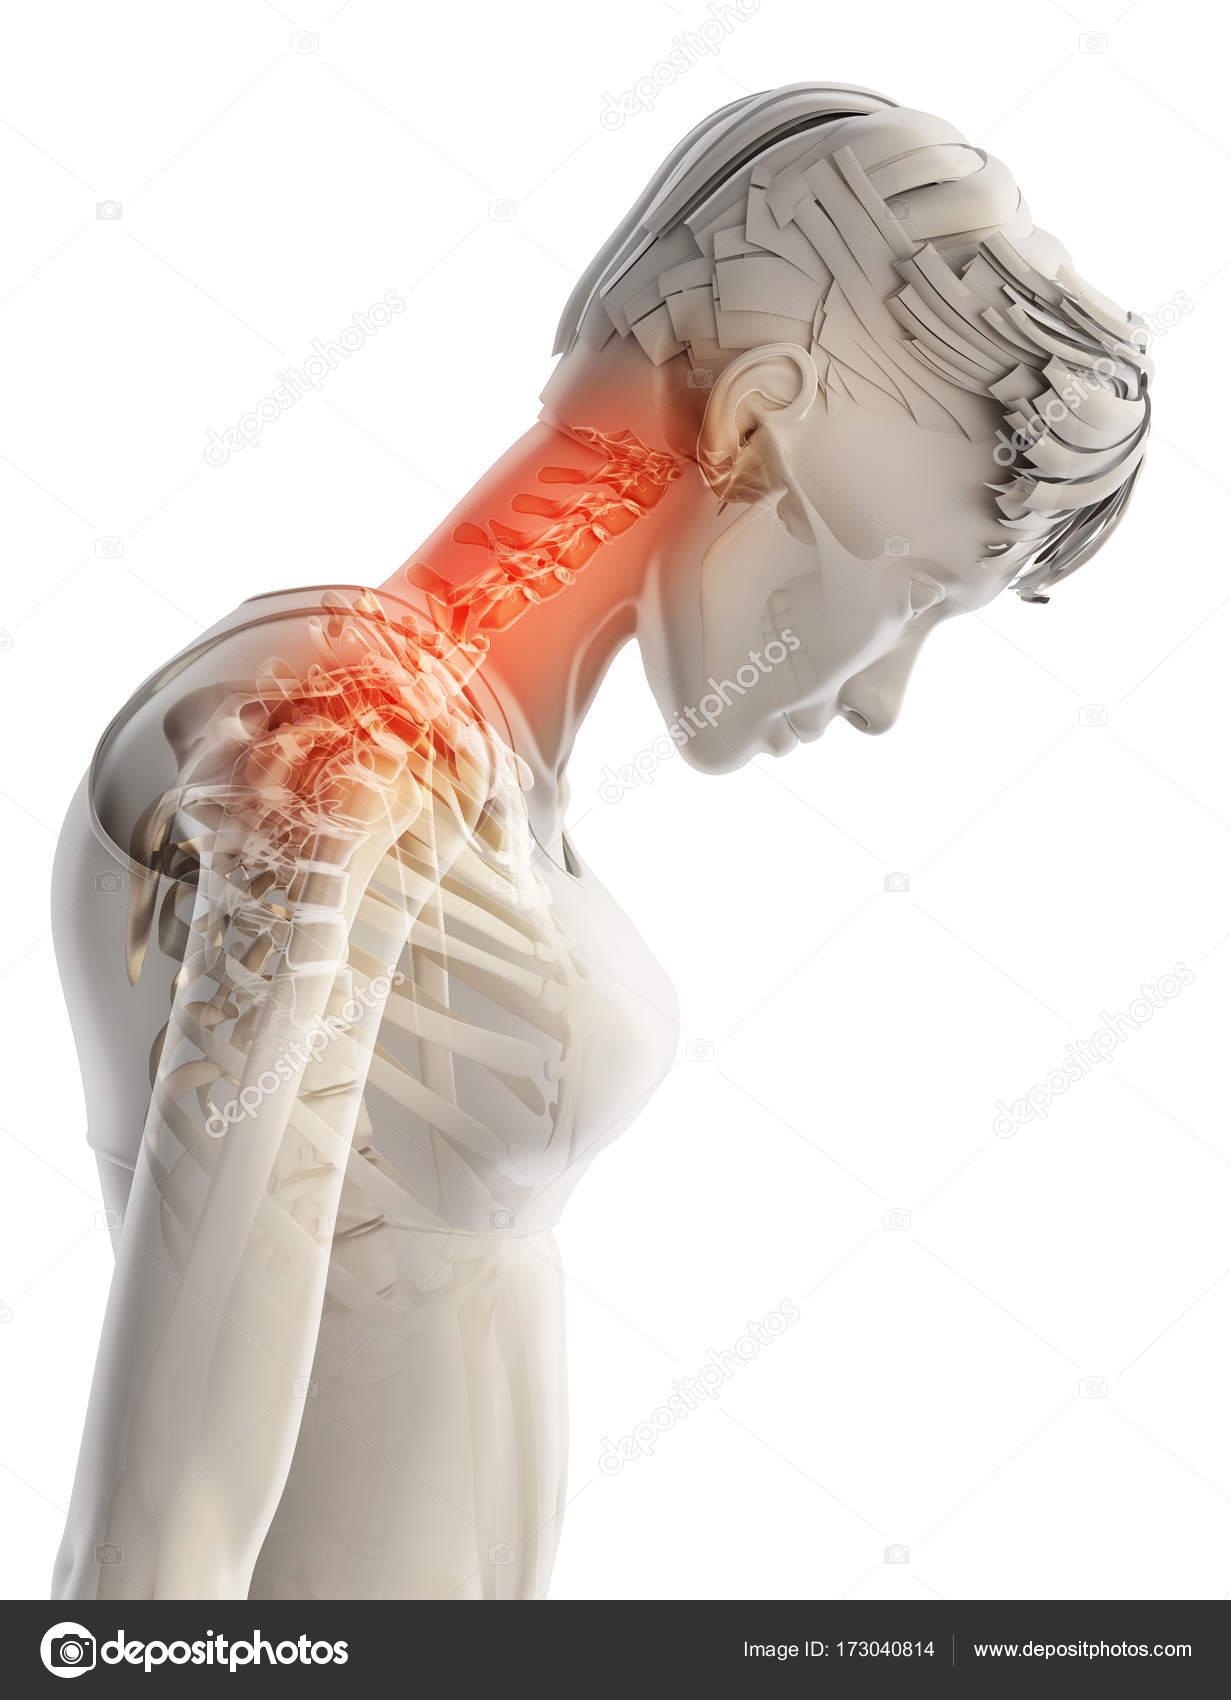 Cuello doloroso - esqueleto radiografía de la columna cervical ...